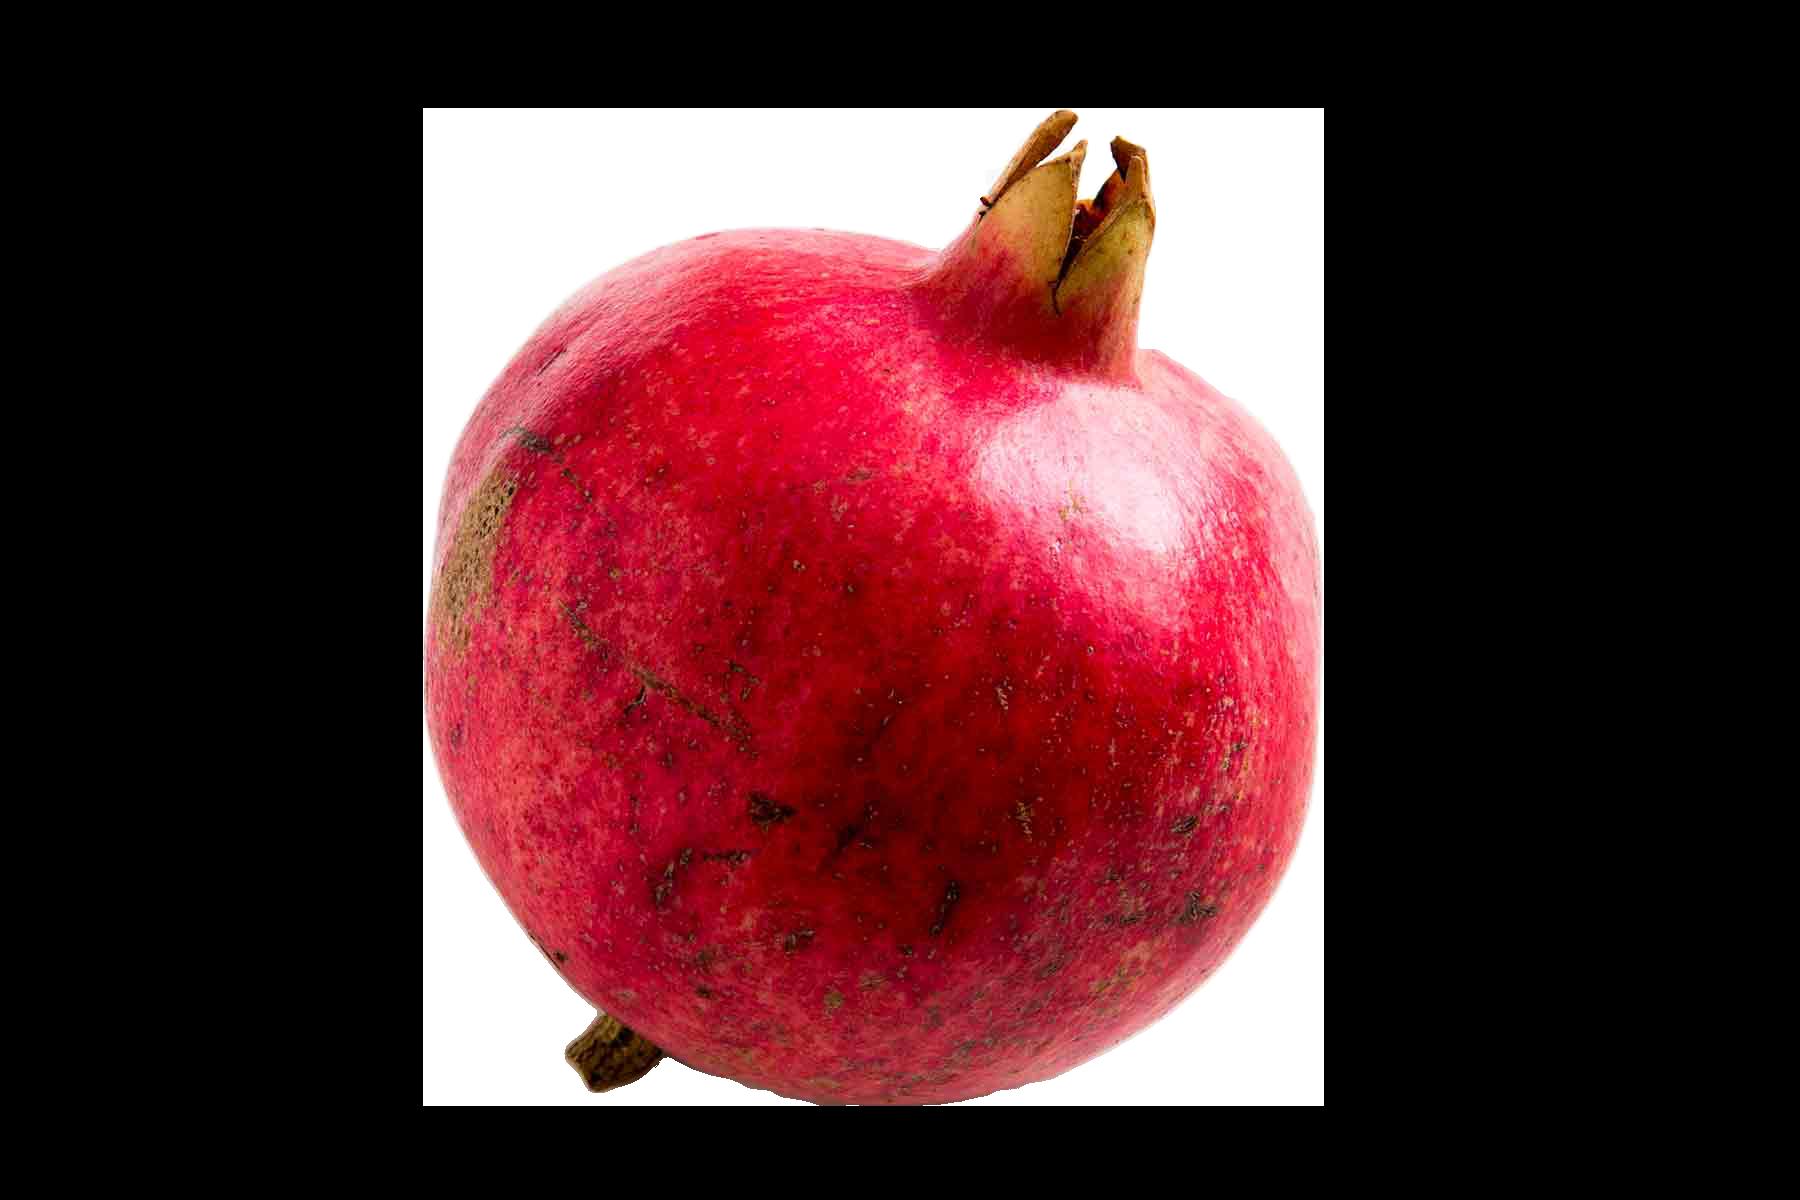 jpg free stock Png image purepng free. Pomegranate clipart pomegranate fruit